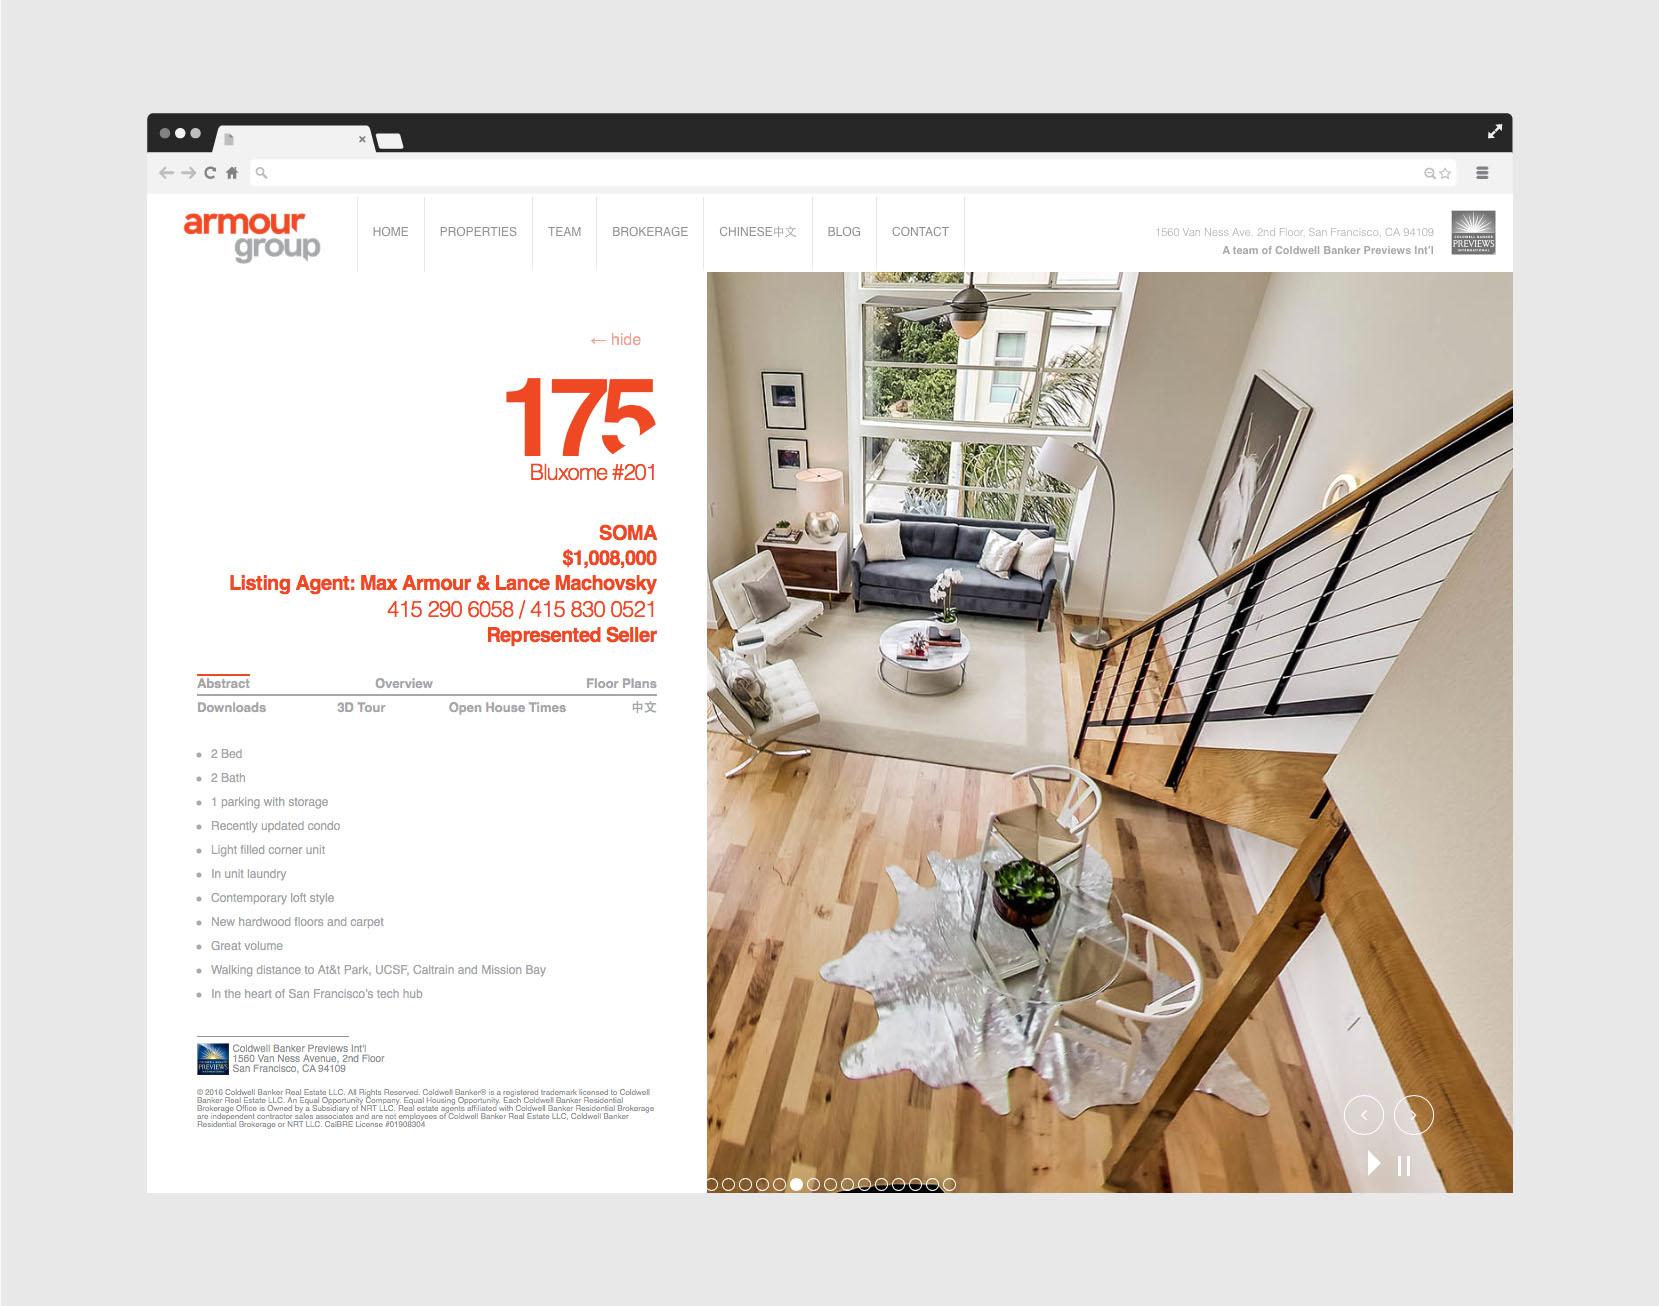 Armour Group SF Single Property Page.jpg